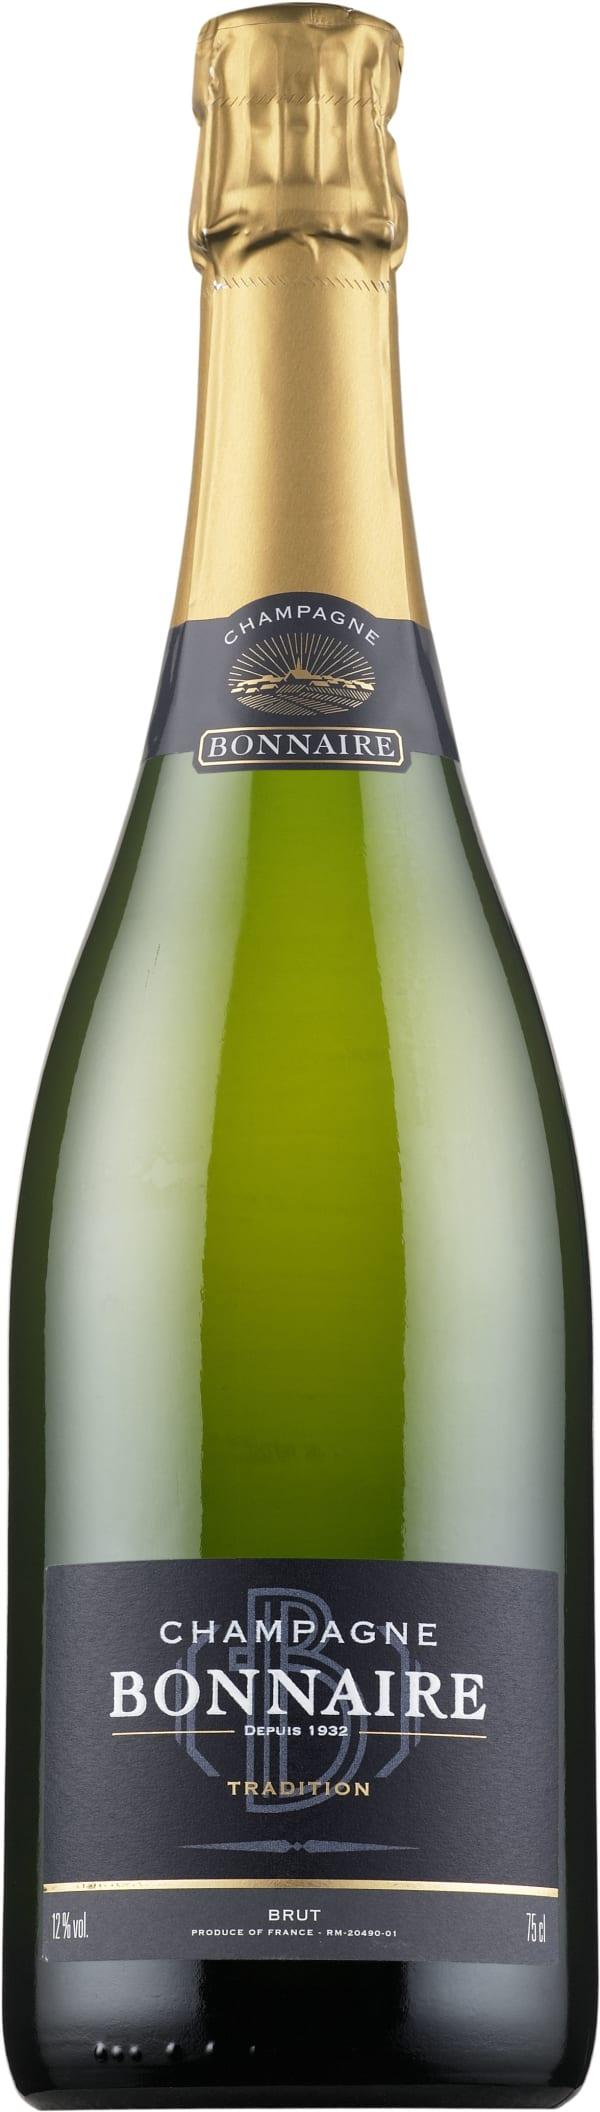 Bonnaire Tradition Champagne Brut